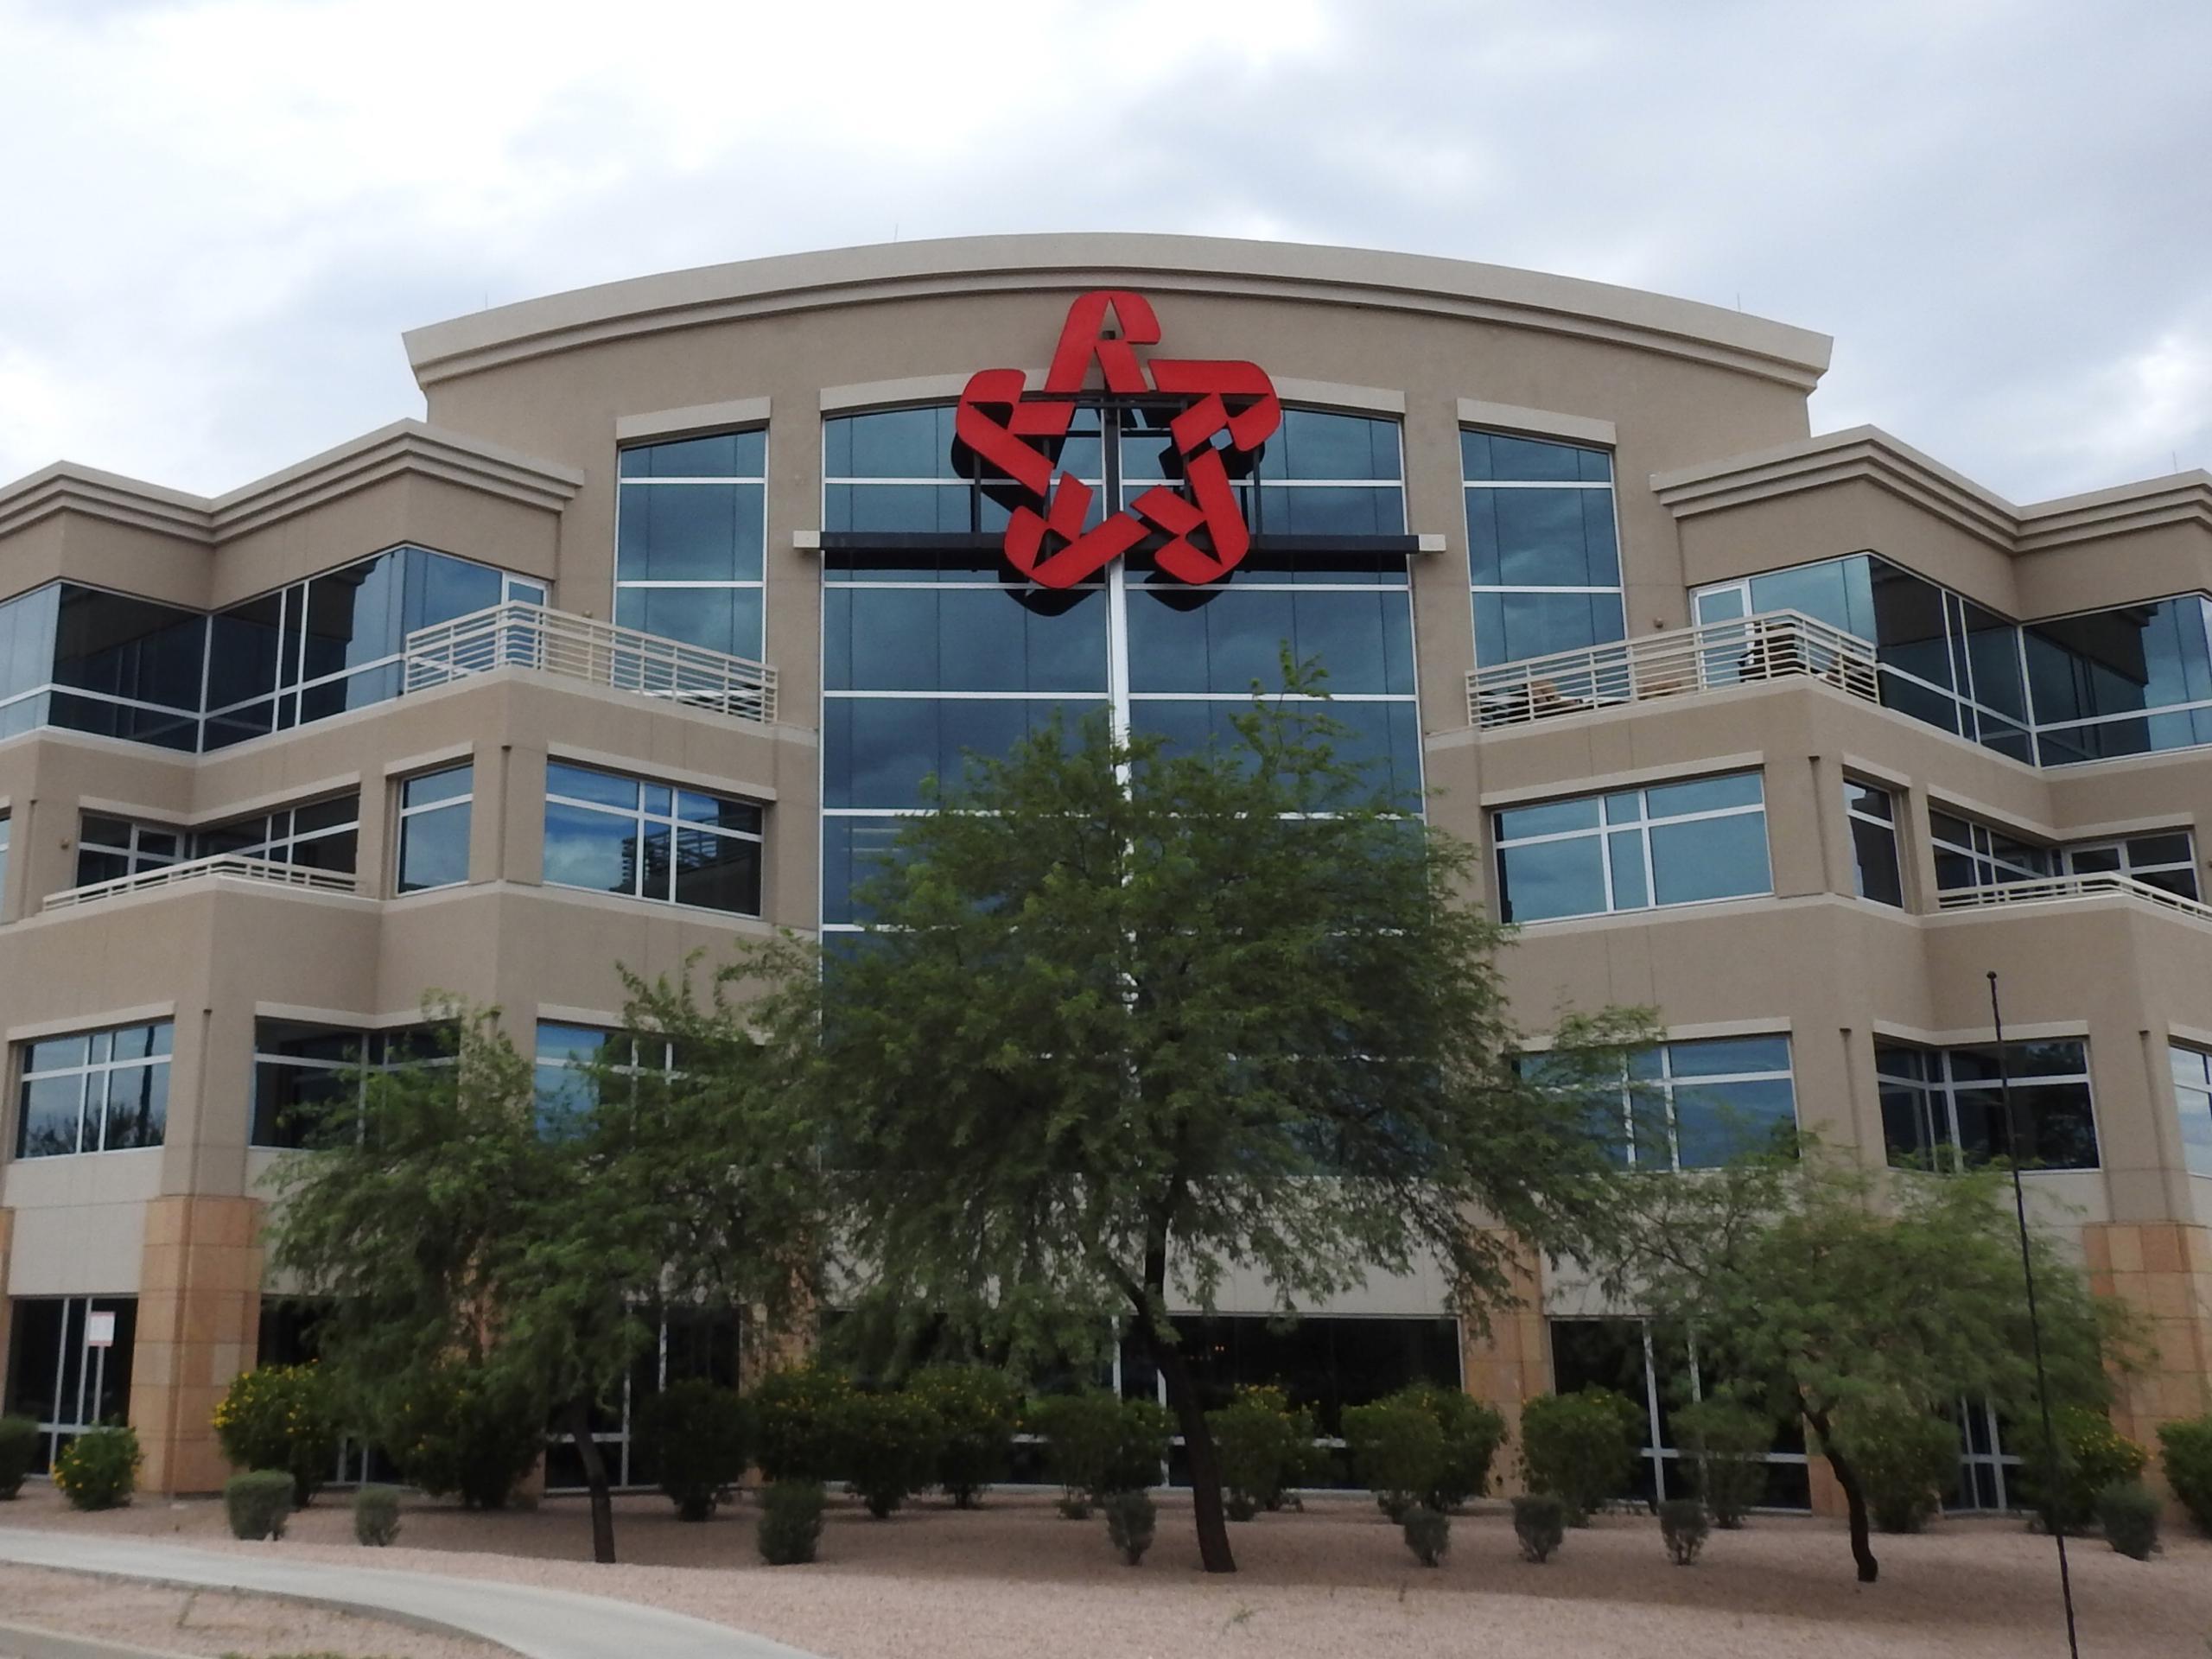 Republic Services' corporate headquarters in Phoenix, Arizona.